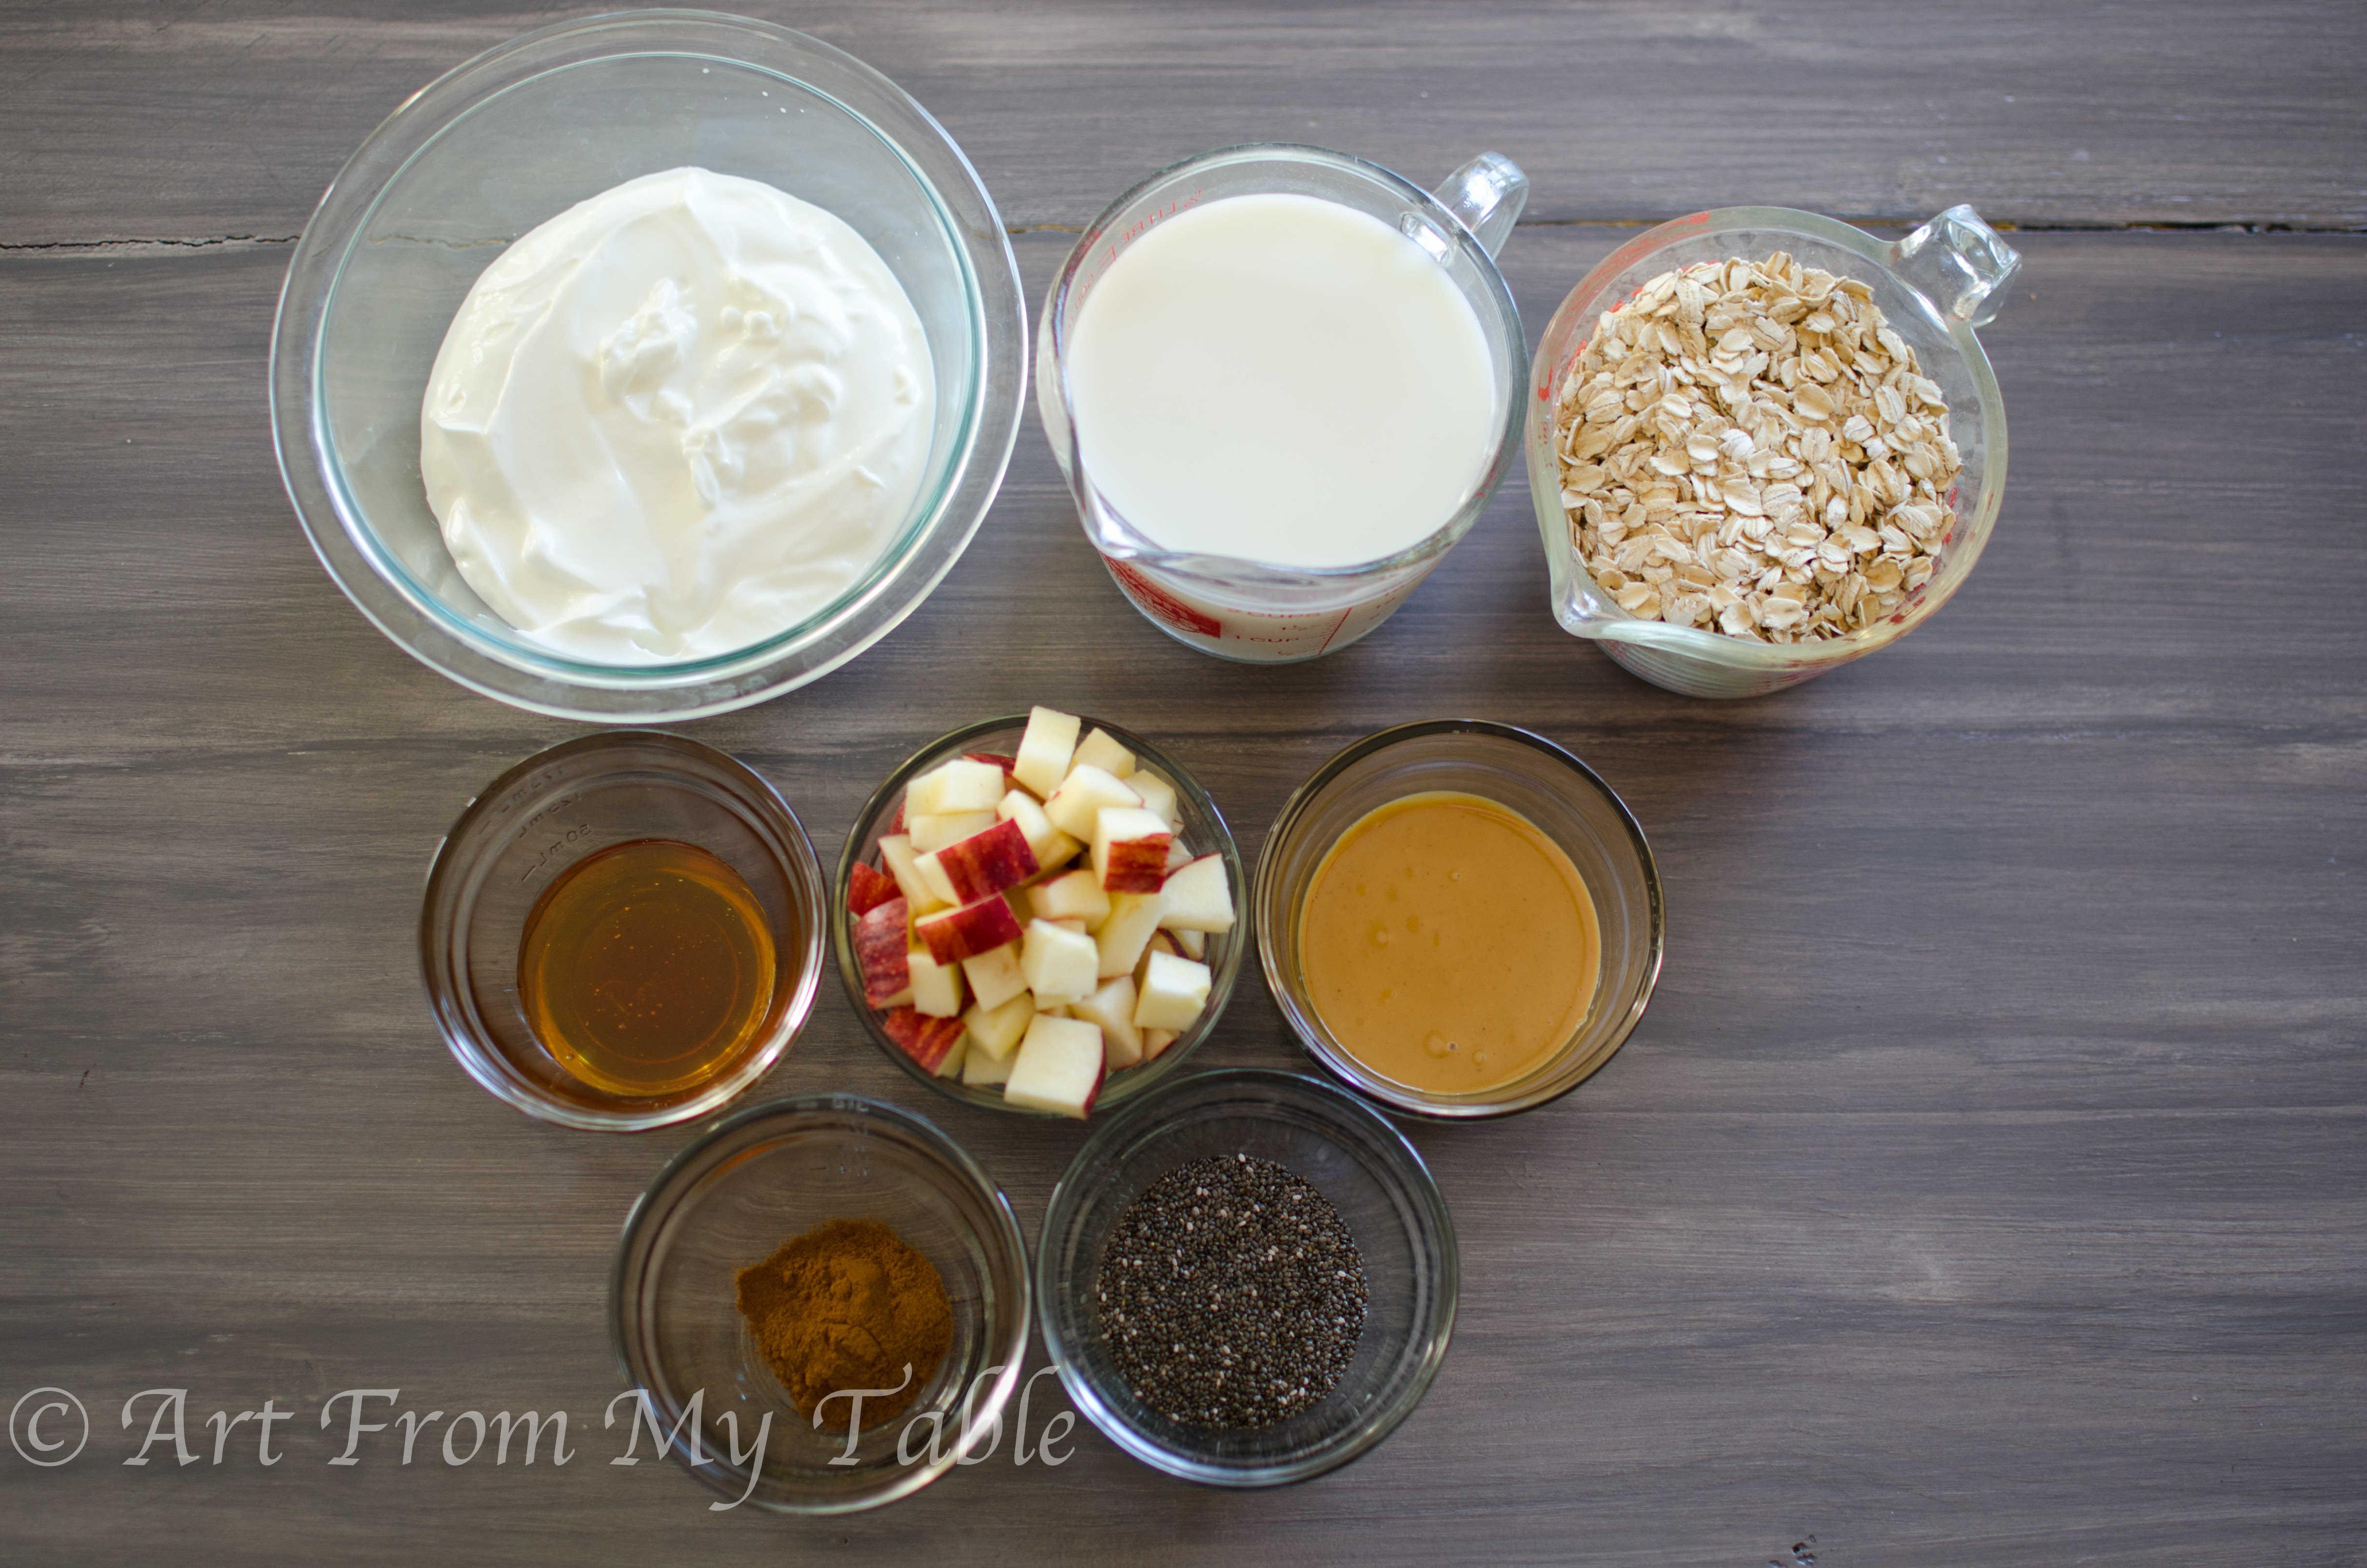 Ingredients for Overnight oats: Yogurt, milk, oats, honey, peanut butter, chia seeds, apples, cinnamon.